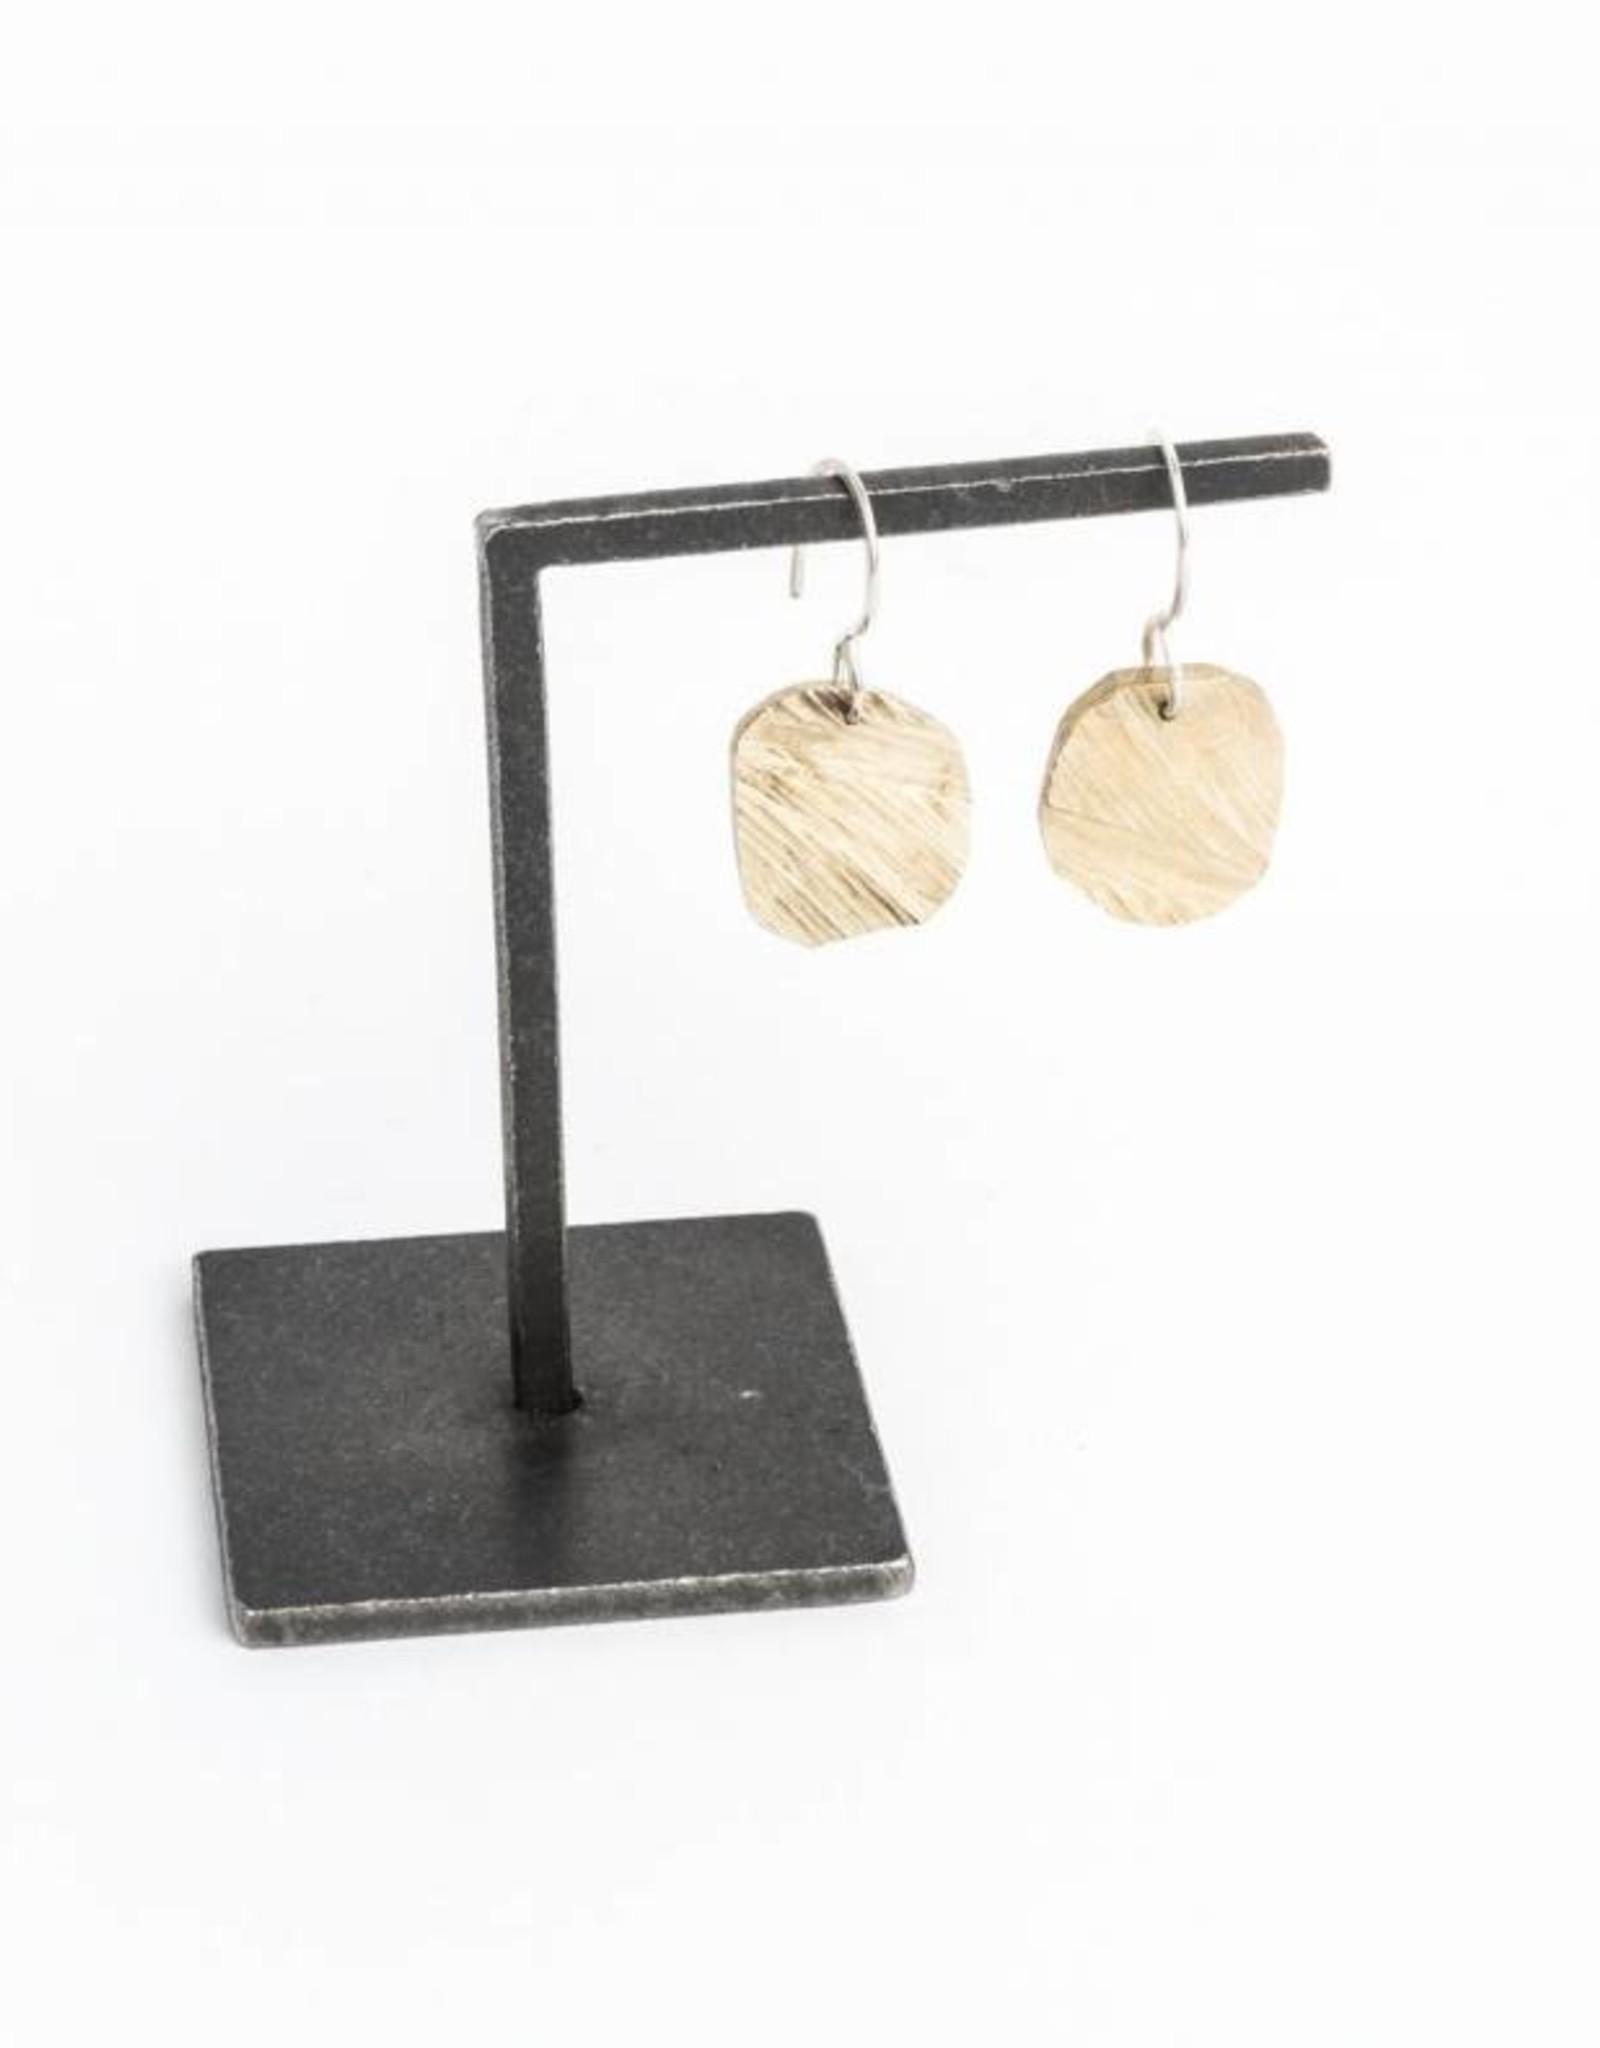 Chikahisa Studio Elemental Square Drop Earrings - Bronze